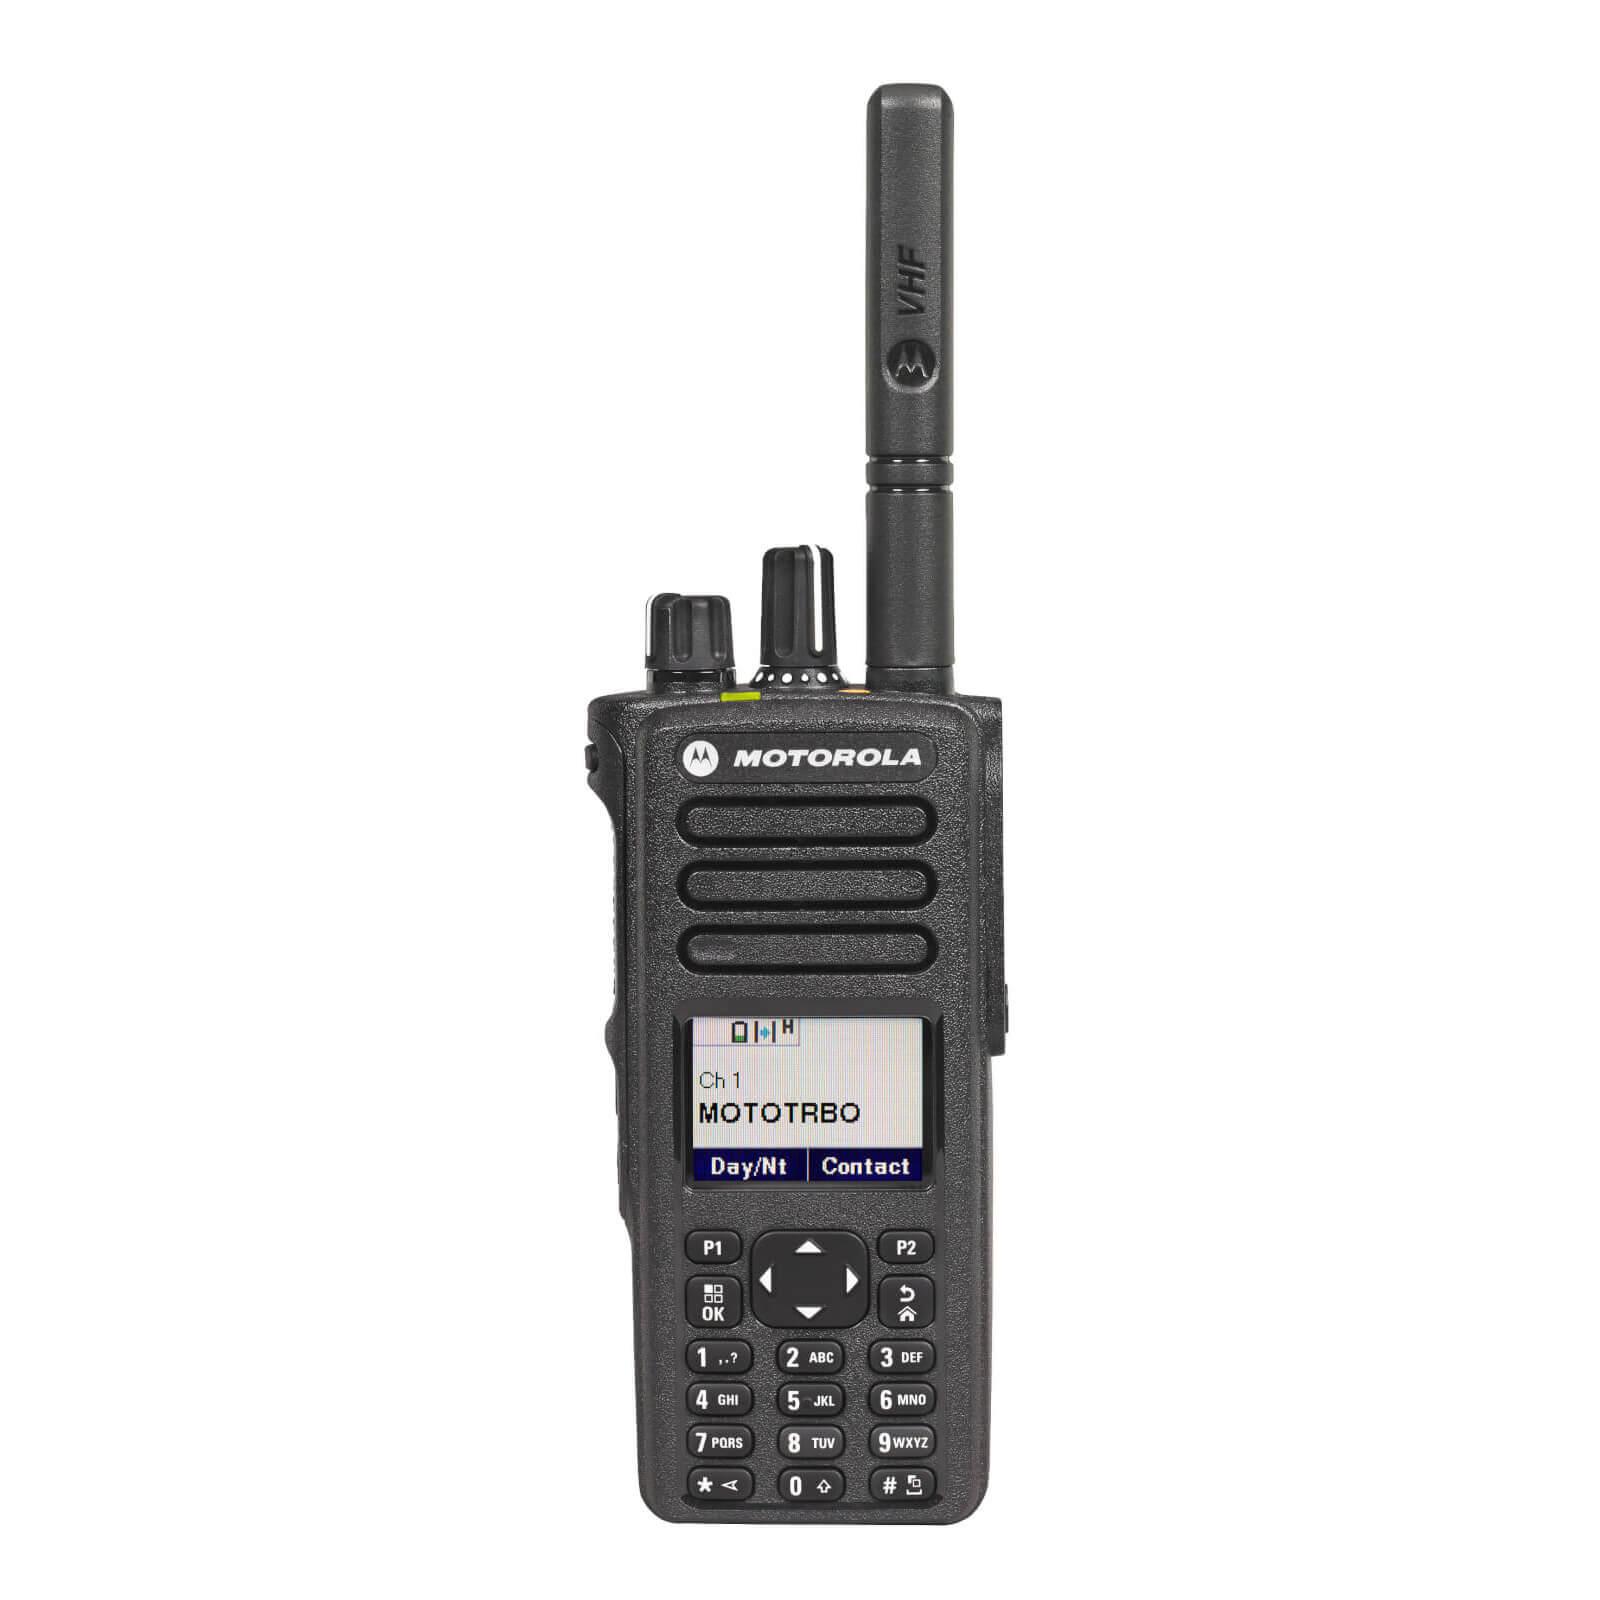 Motorola DP4800e Portable VHF 136-174MHz Keypad/display Inc Antenna, Standard Battery & Belt Clip